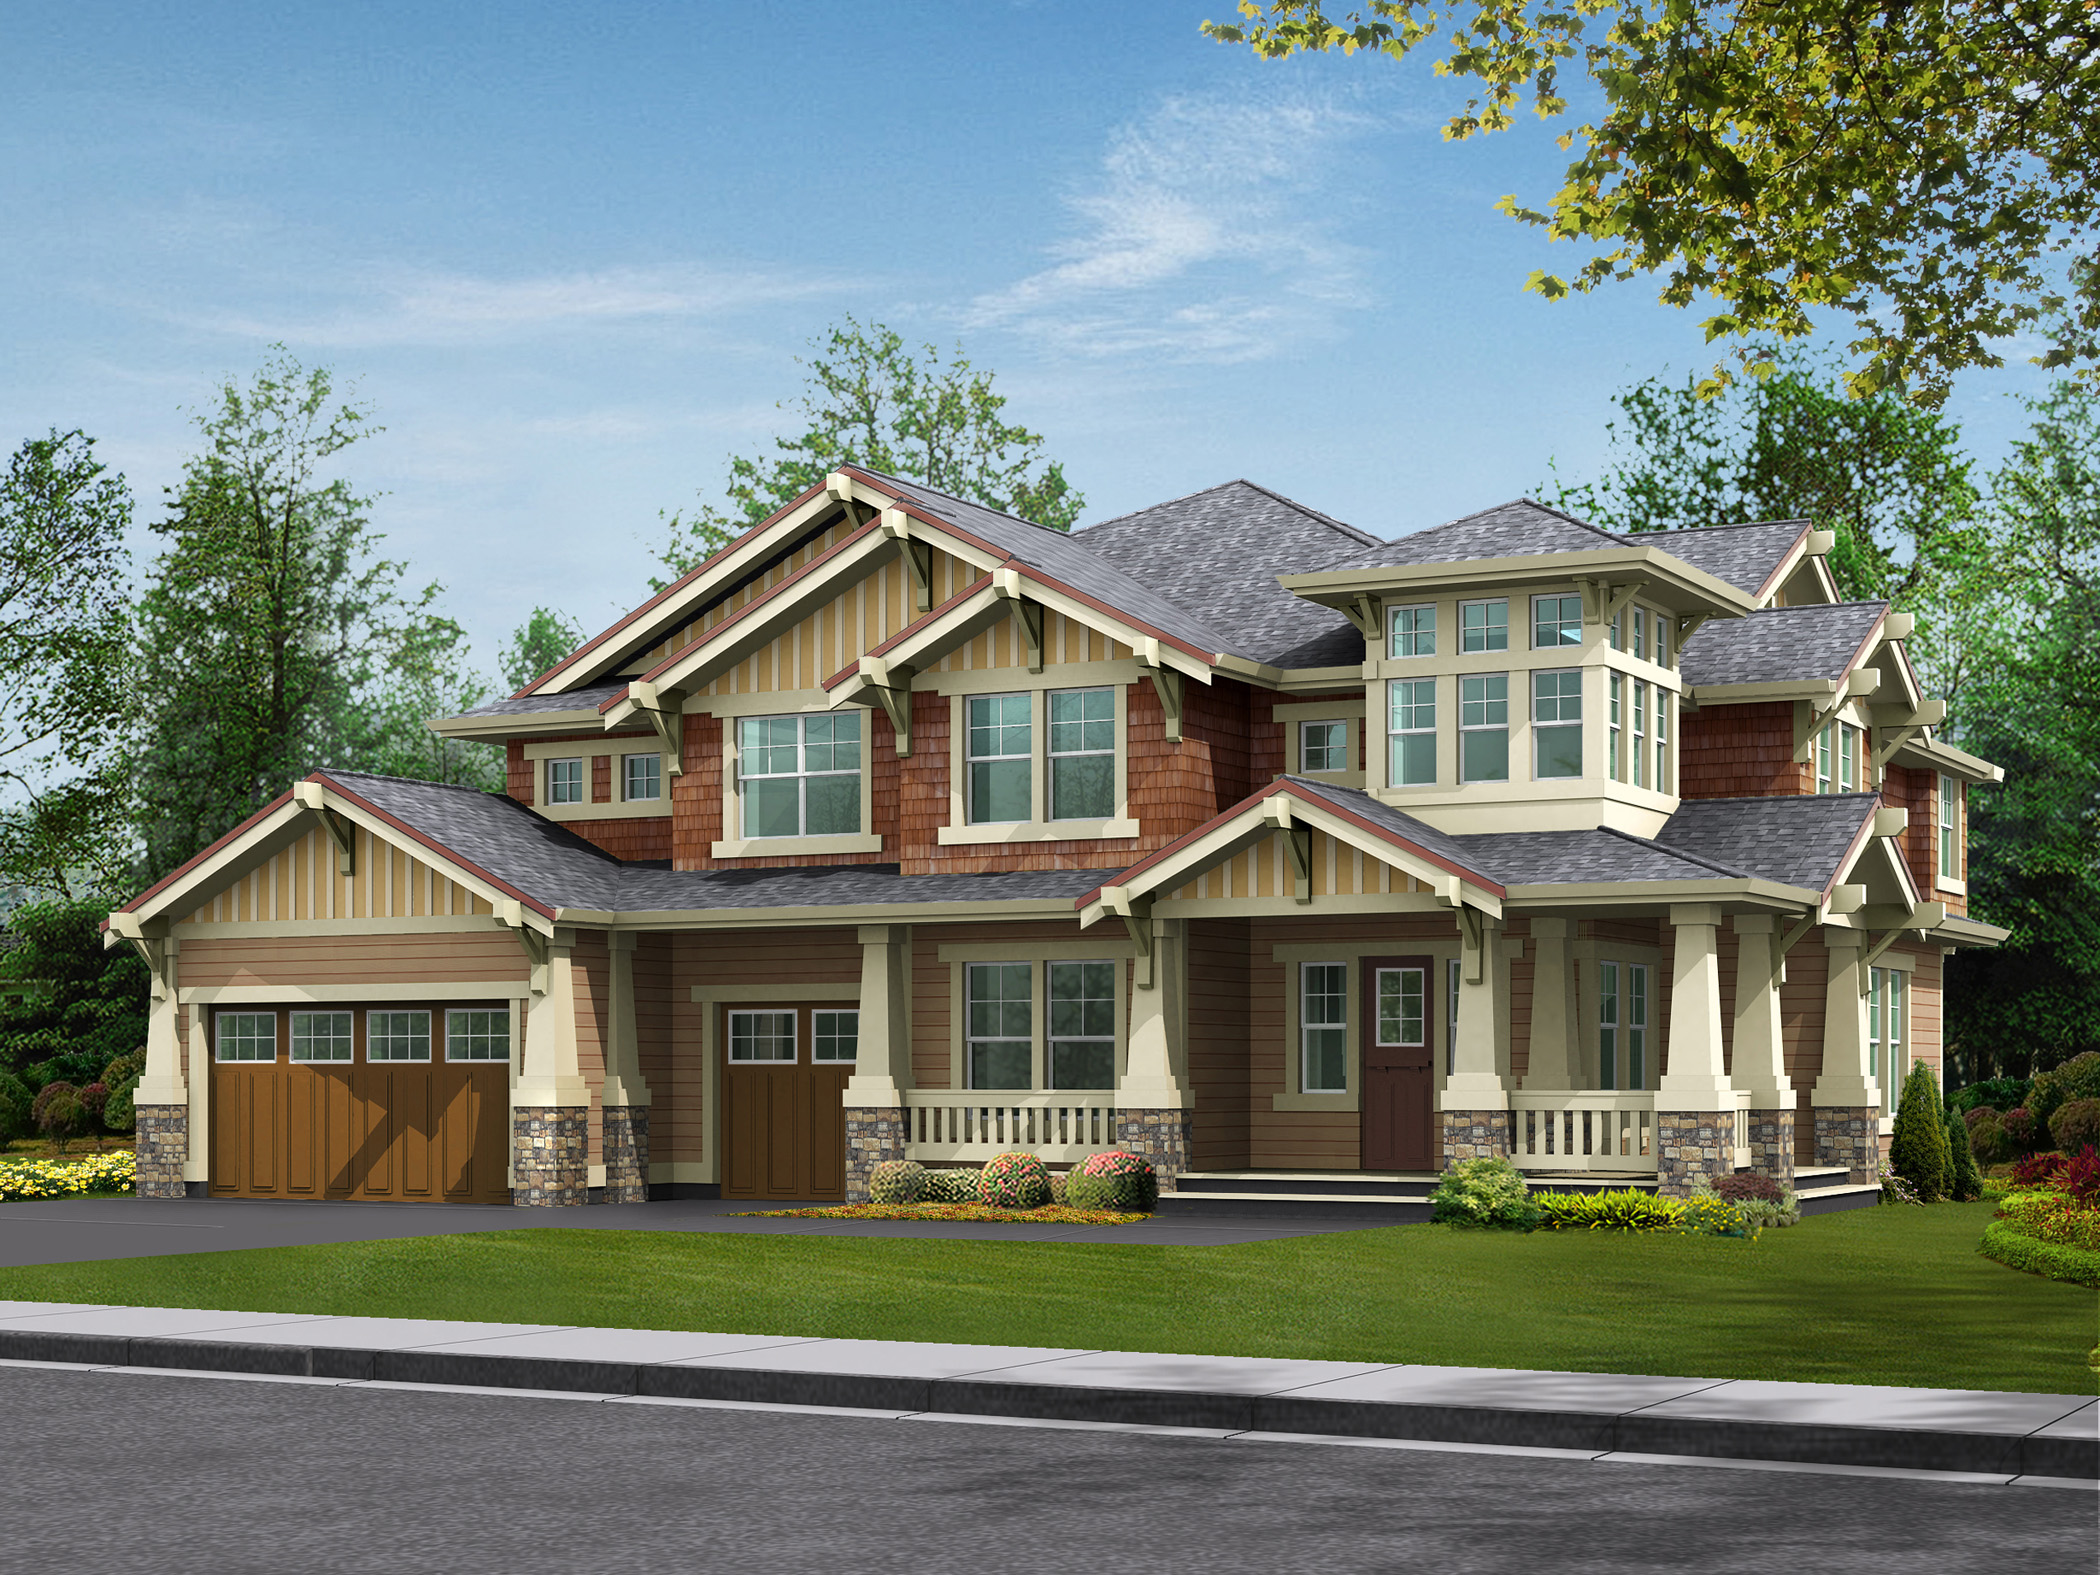 Craftsman detailing at its finest 23173jd for Architectural designs com